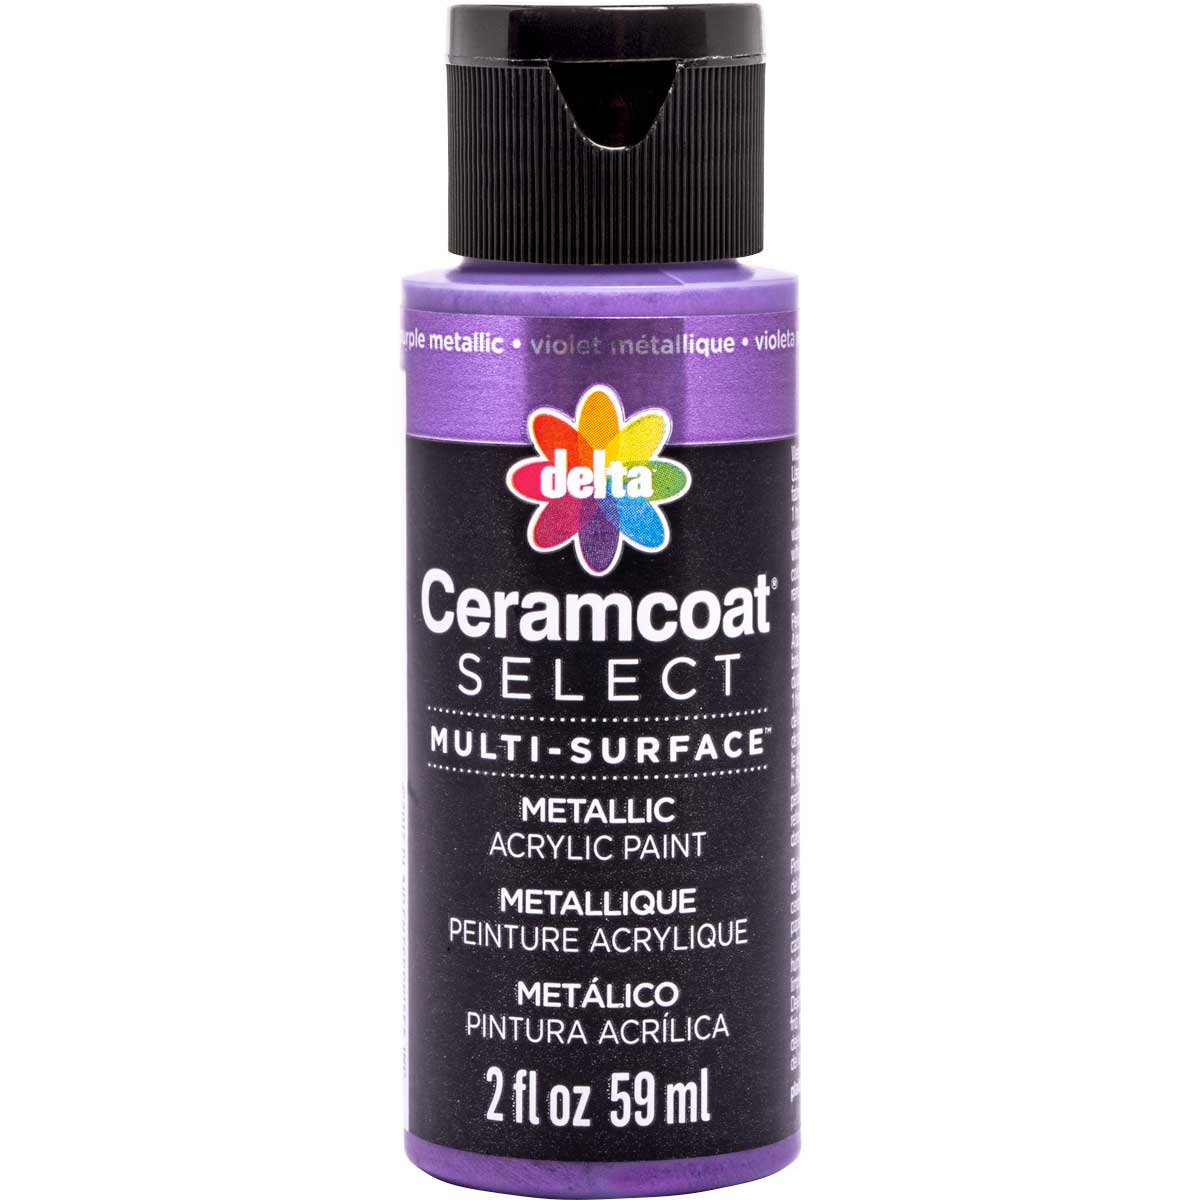 Delta Ceramcoat ® Select Multi-Surface Acrylic Paint - Metallic - Purple, 2 oz.